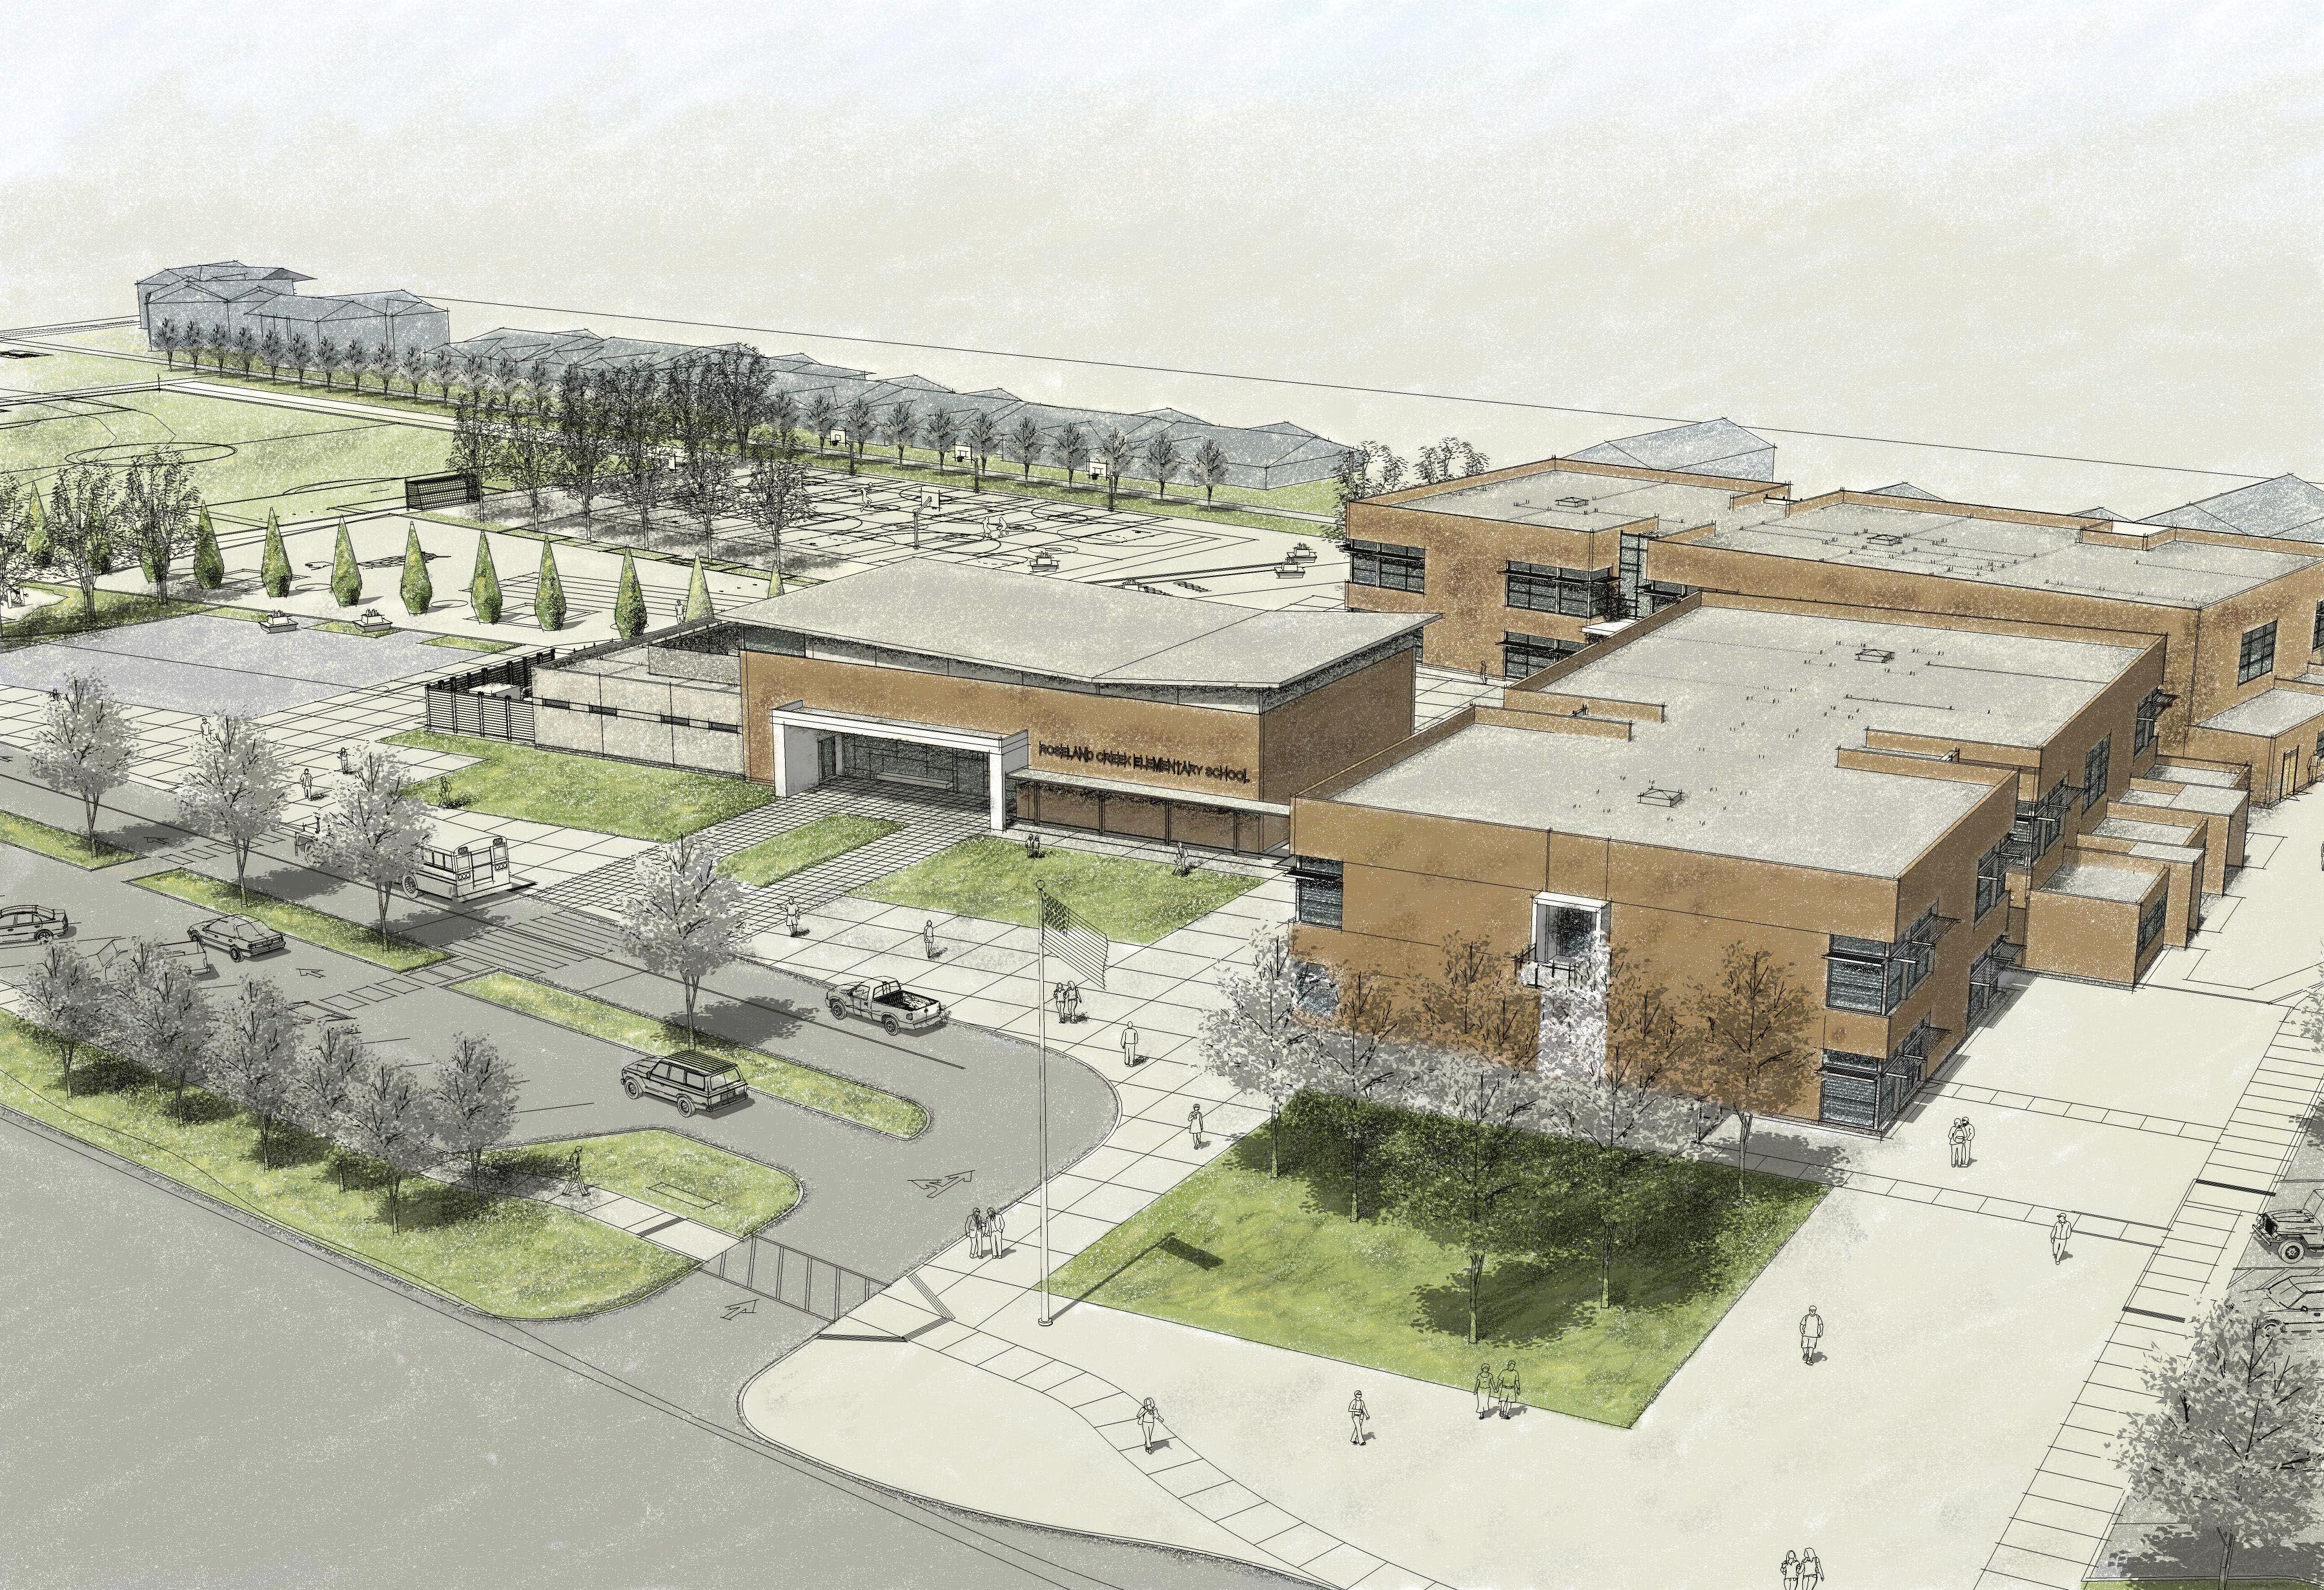 Elementary School Building Design Plans Roseland Creek Elementary School Bids Tlcd Today